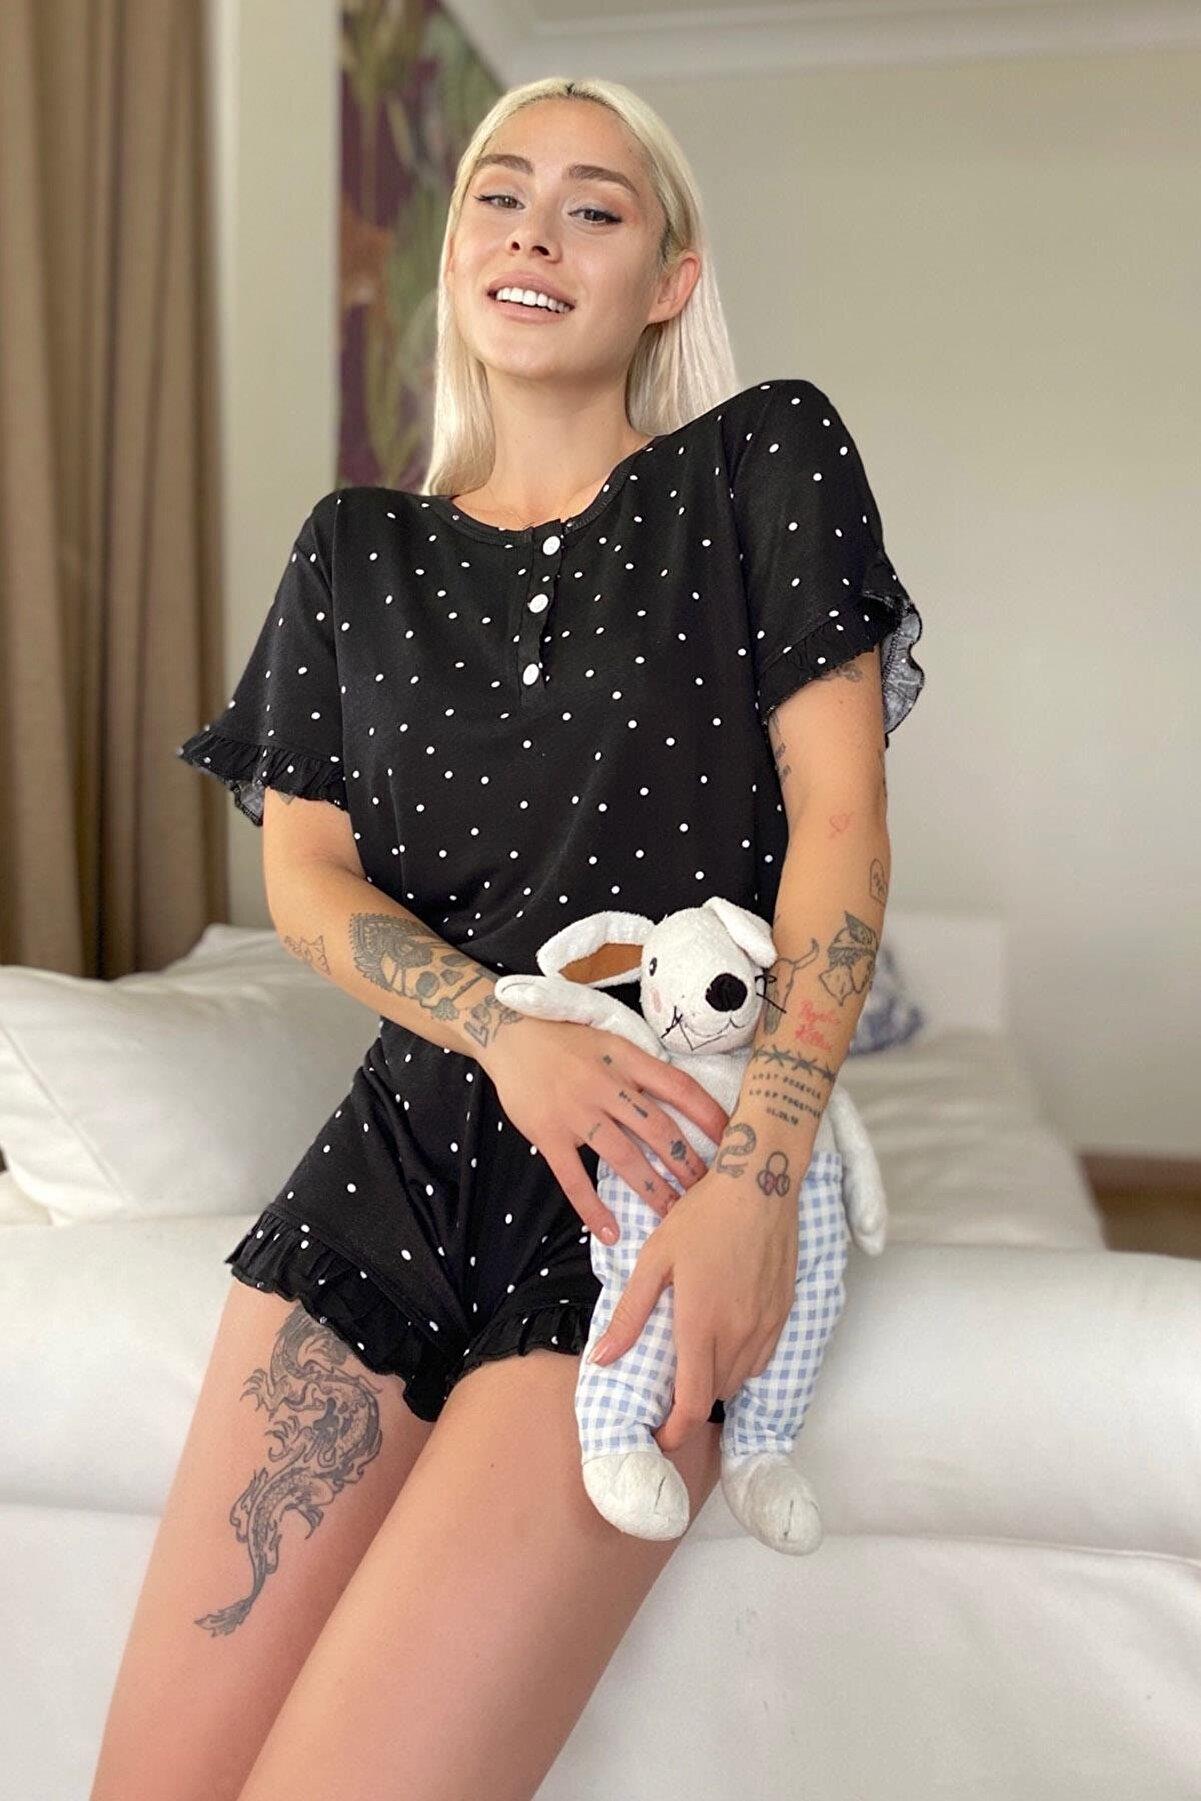 Pijamaevi Puan Desenli Örme Kısa Kol Şortlu Pijama Takımı